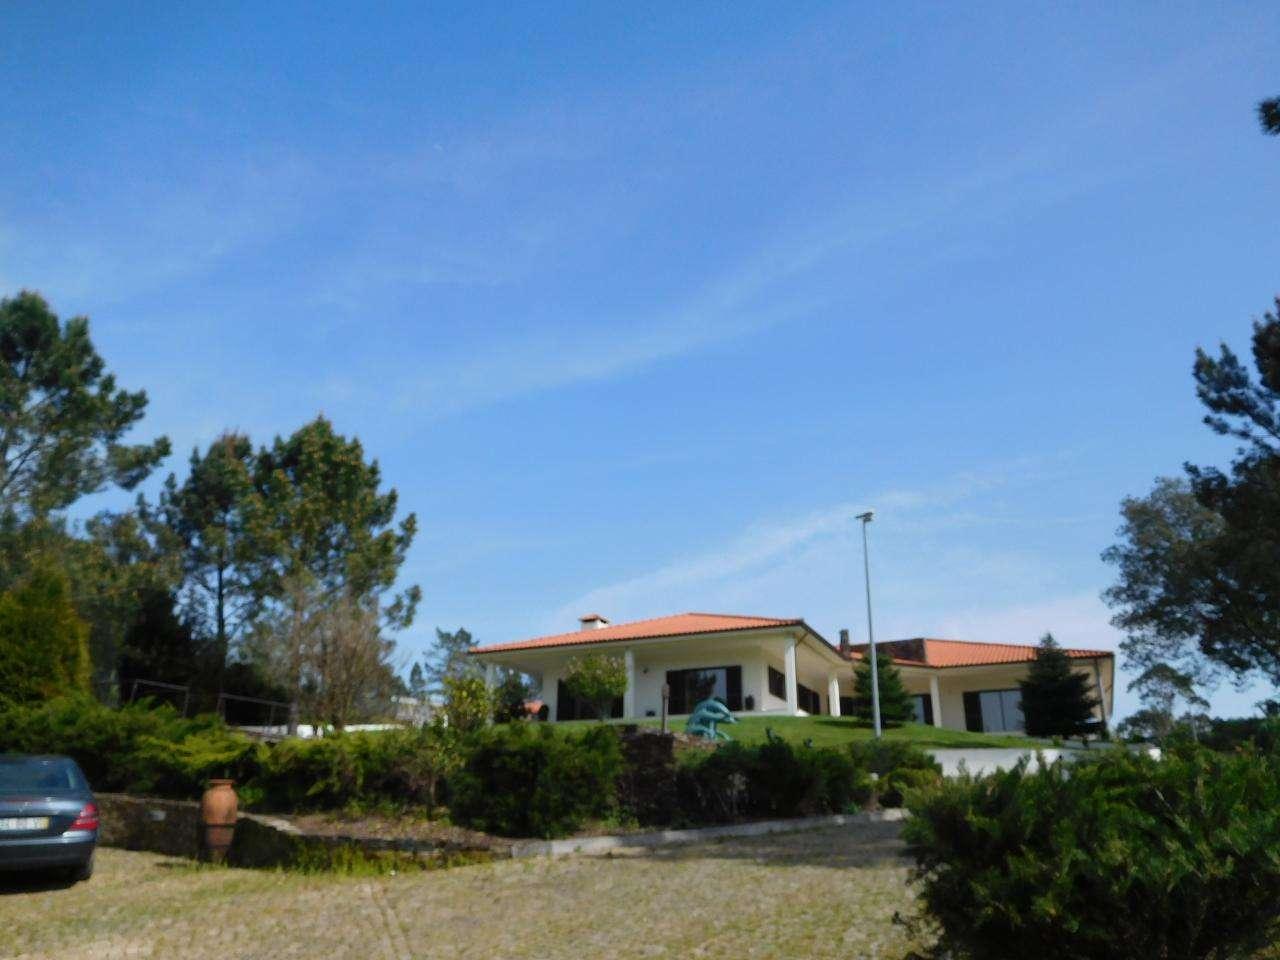 Moradia para comprar, Aguiar de Sousa, Porto - Foto 3